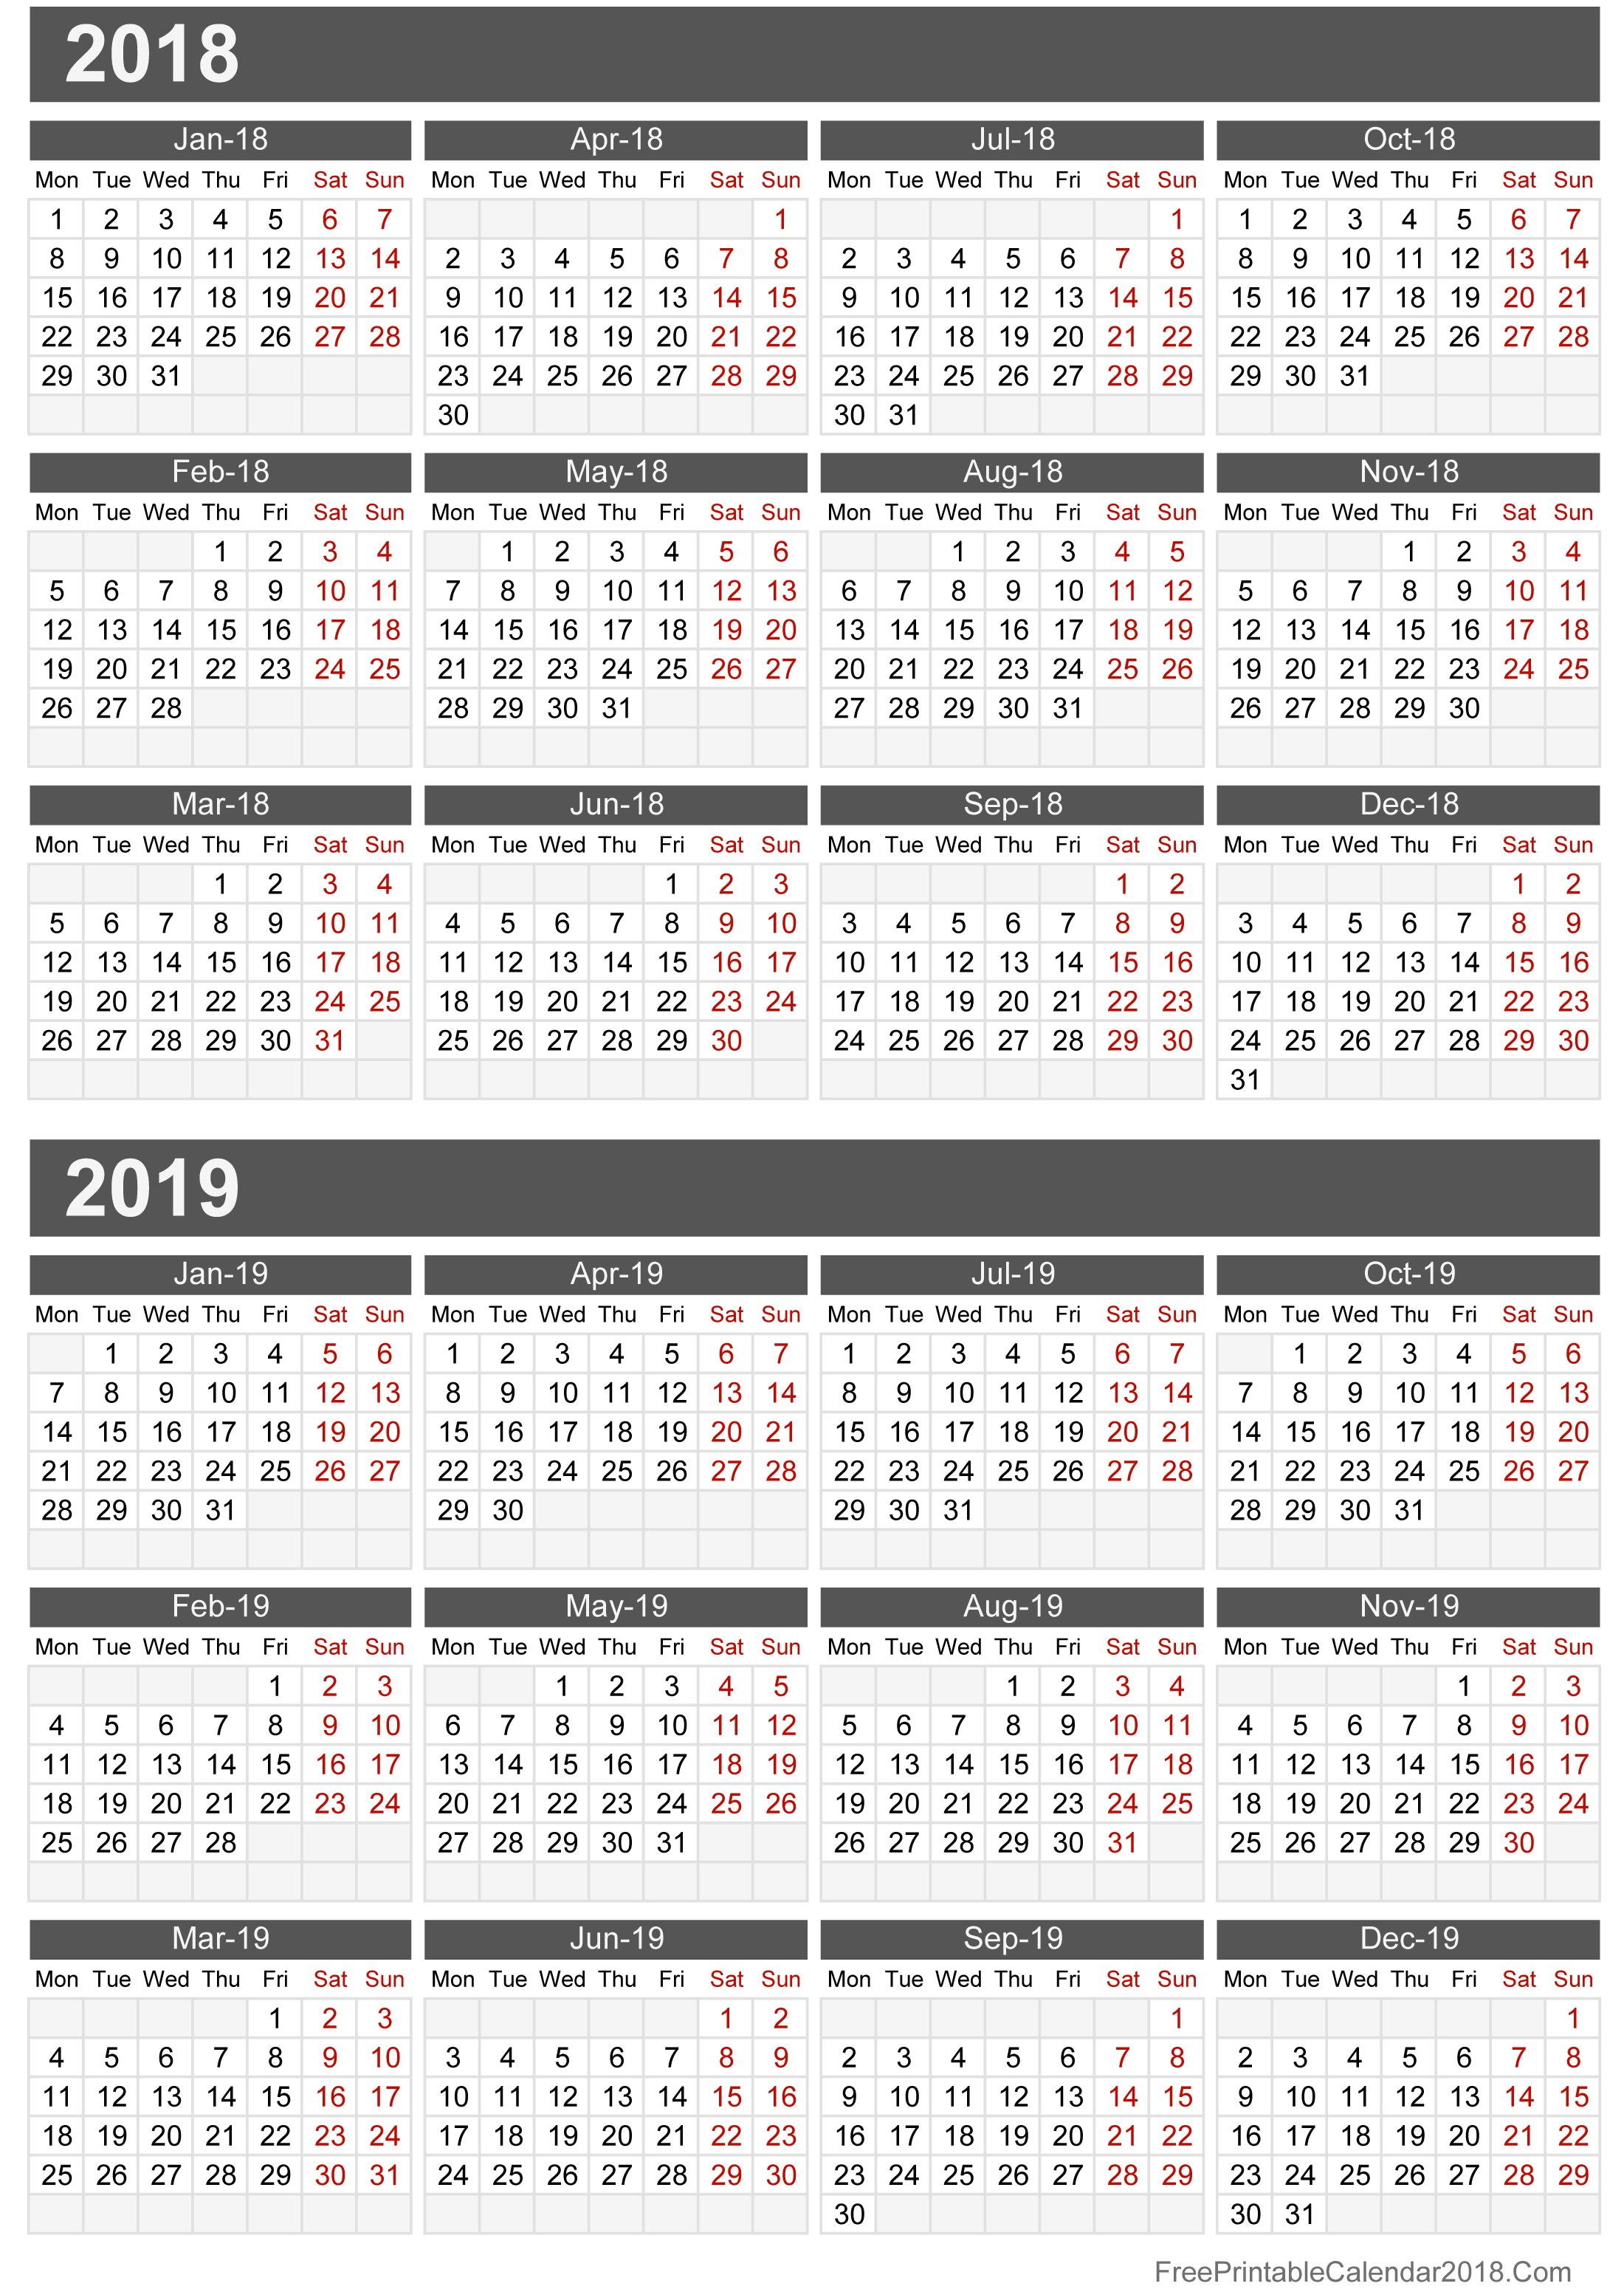 2018 2019 Calendar Free Printable Two Year Pdf Calendars By Free